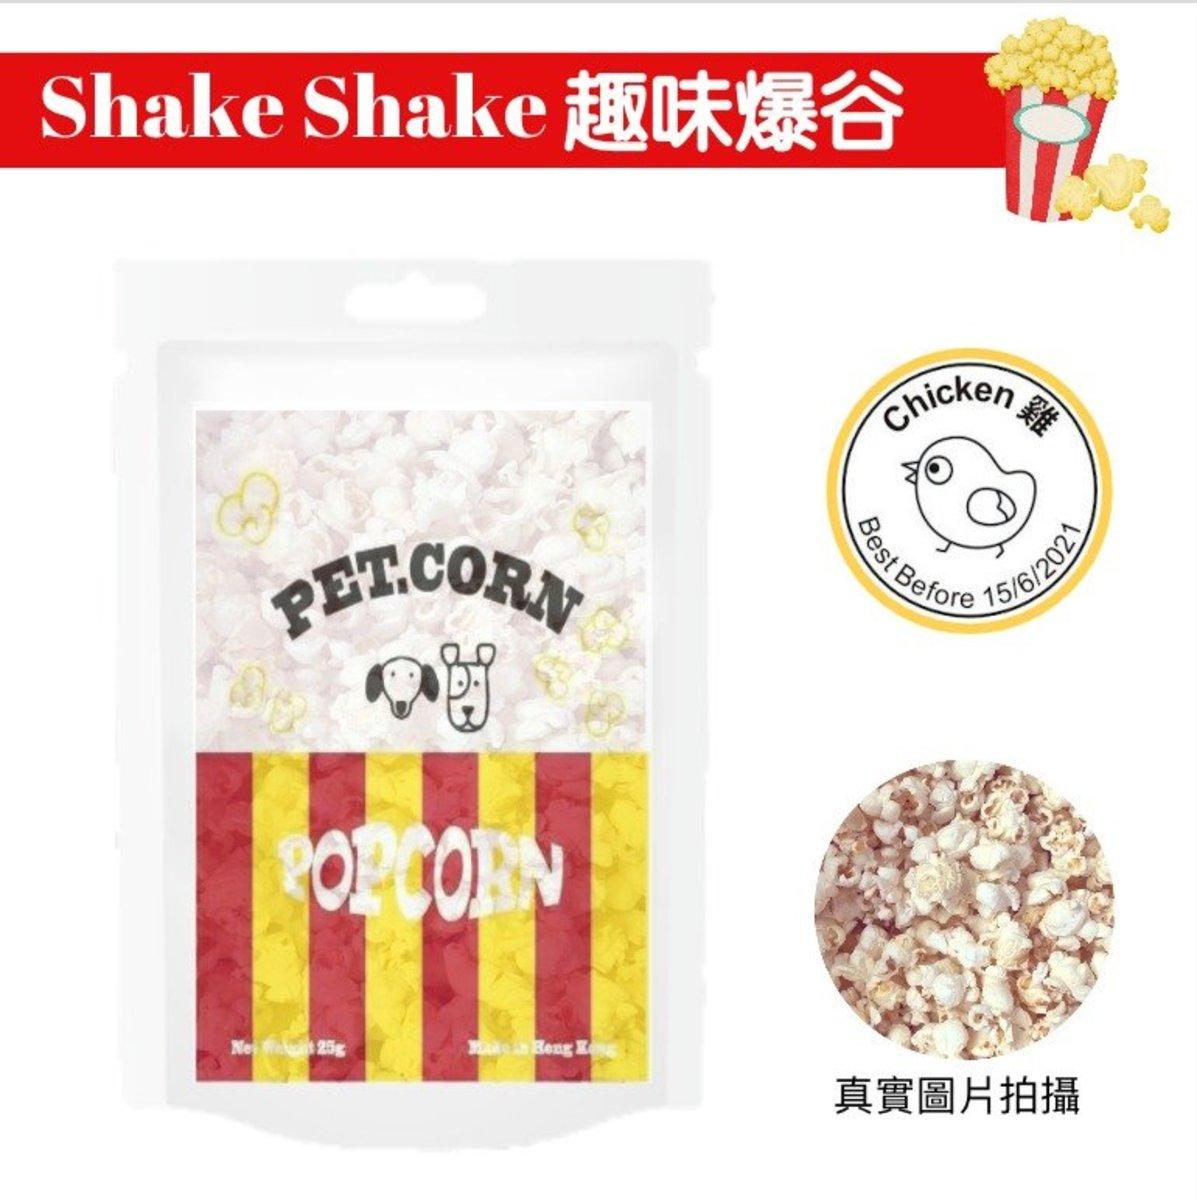 Shake Shake POP CORN - CHICKEN